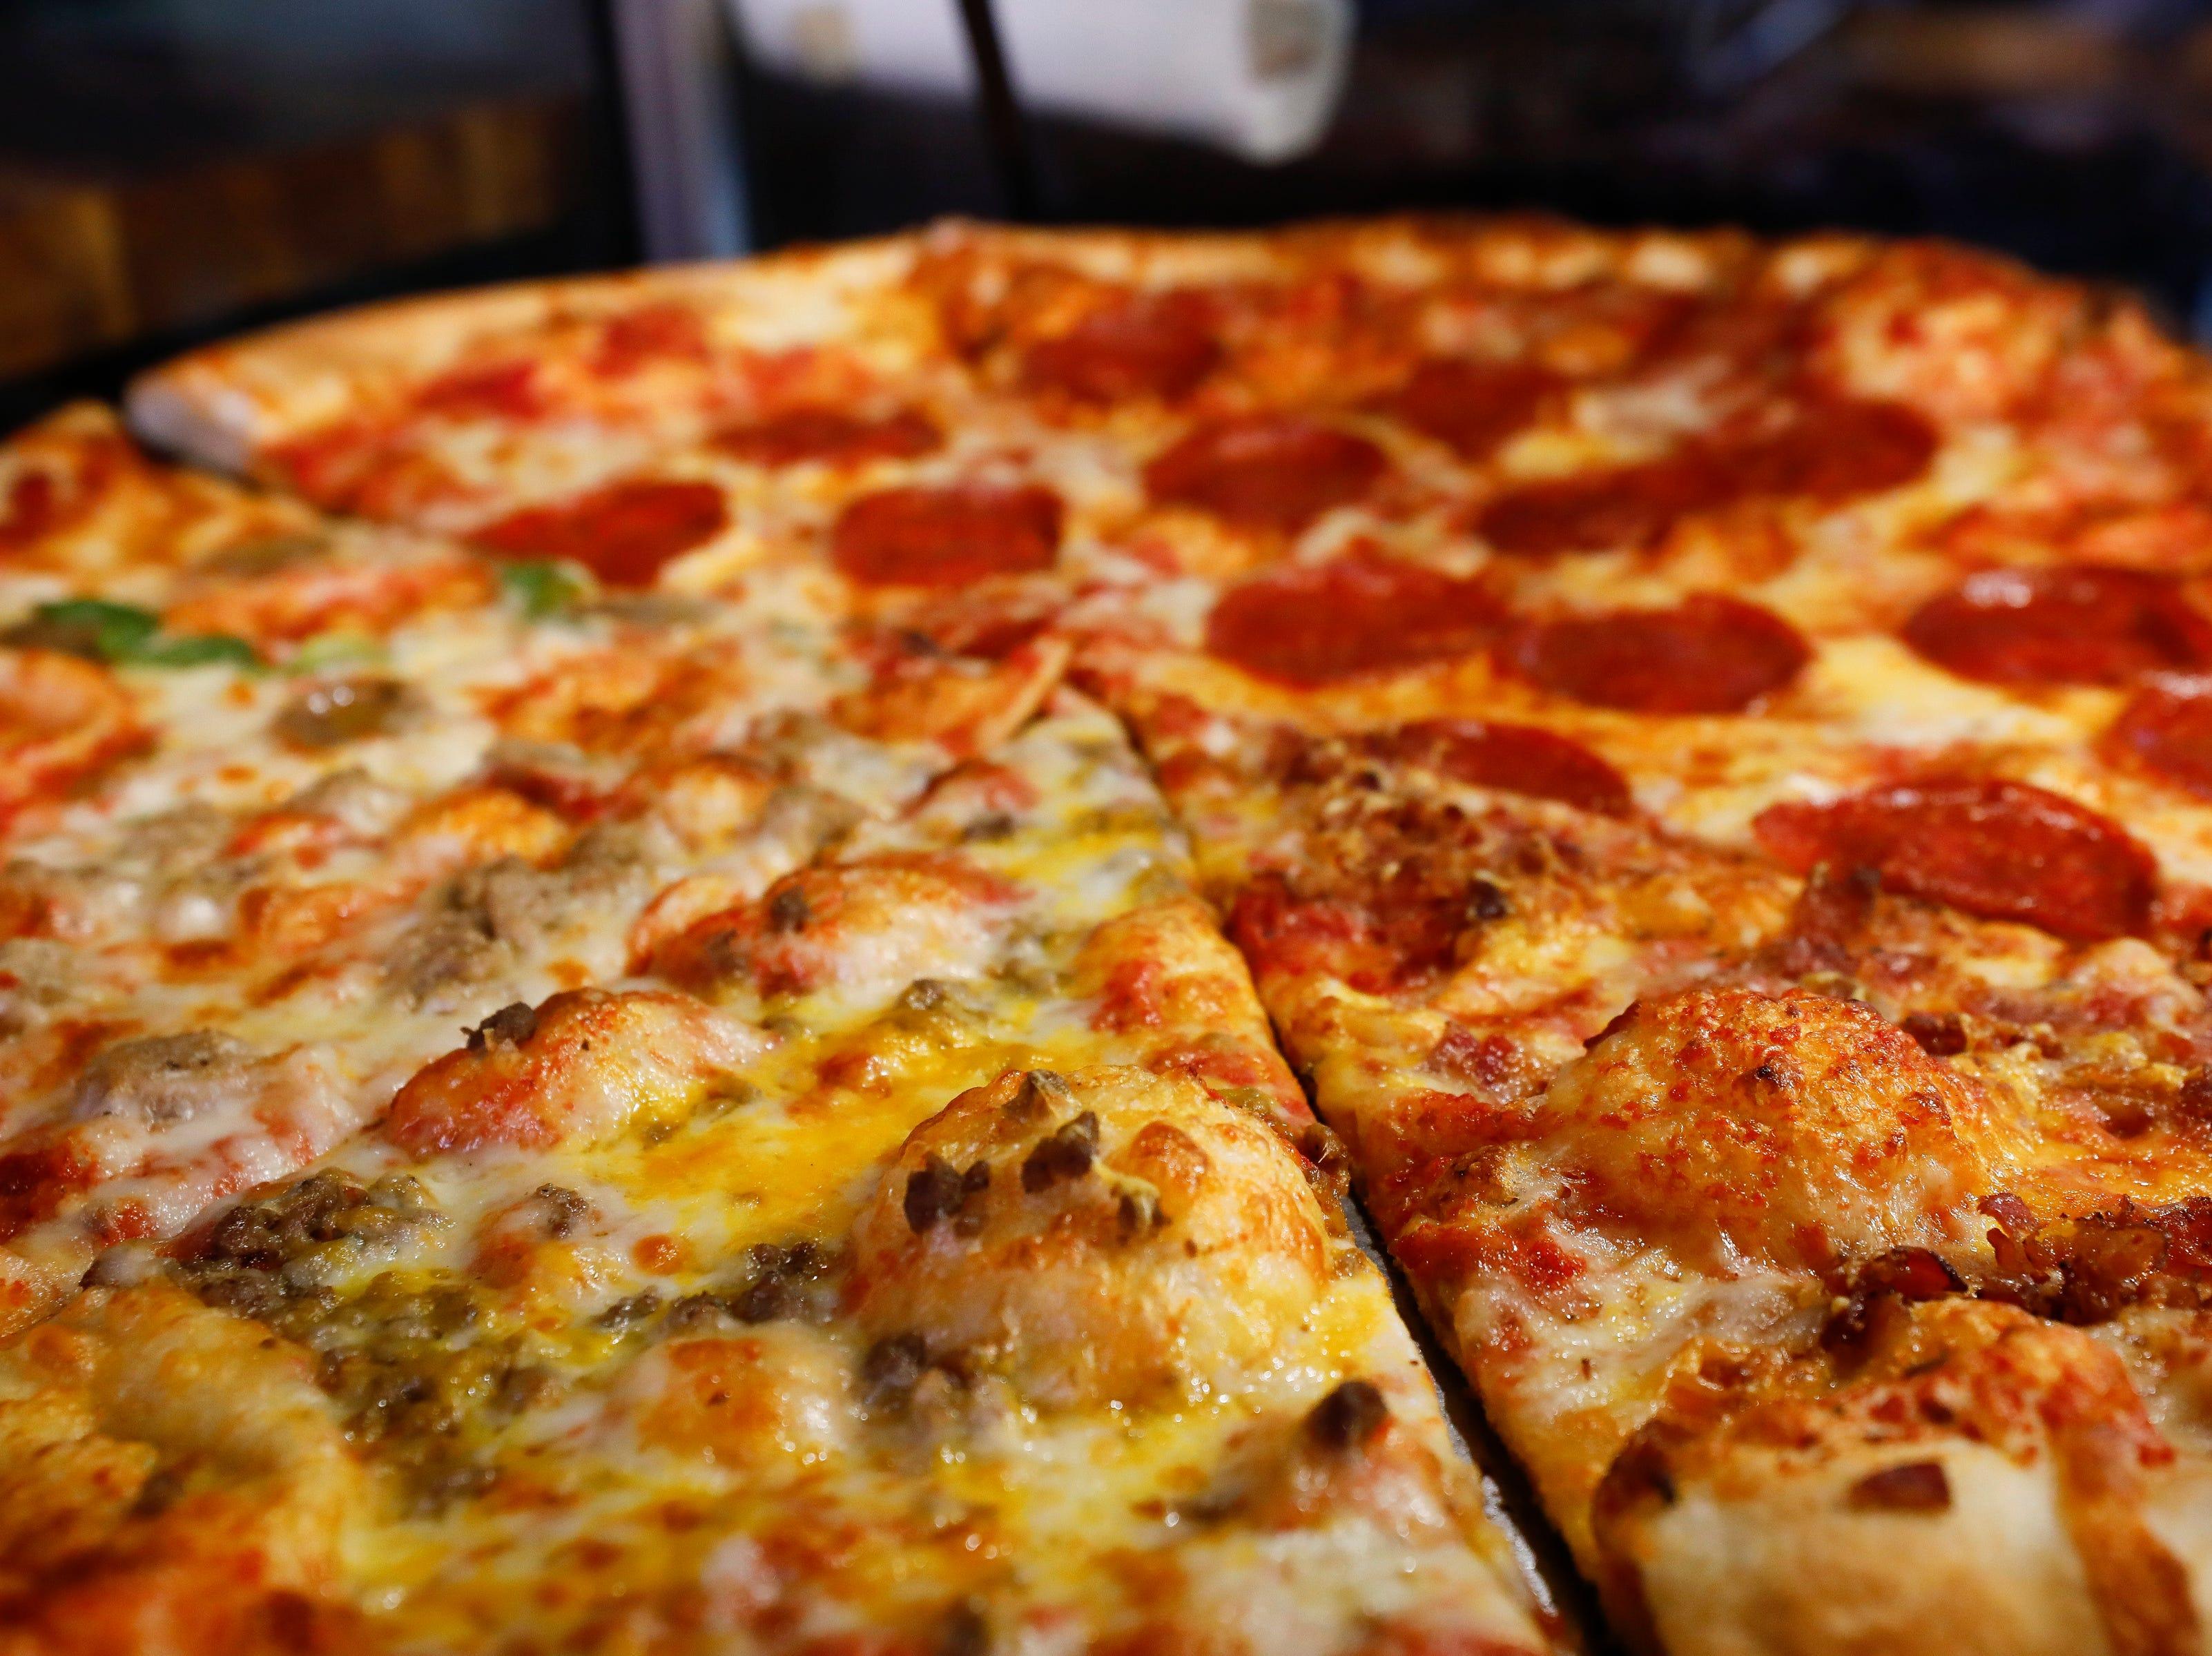 Boston - not New York - has the best pizzeria, according to TripAdvisor